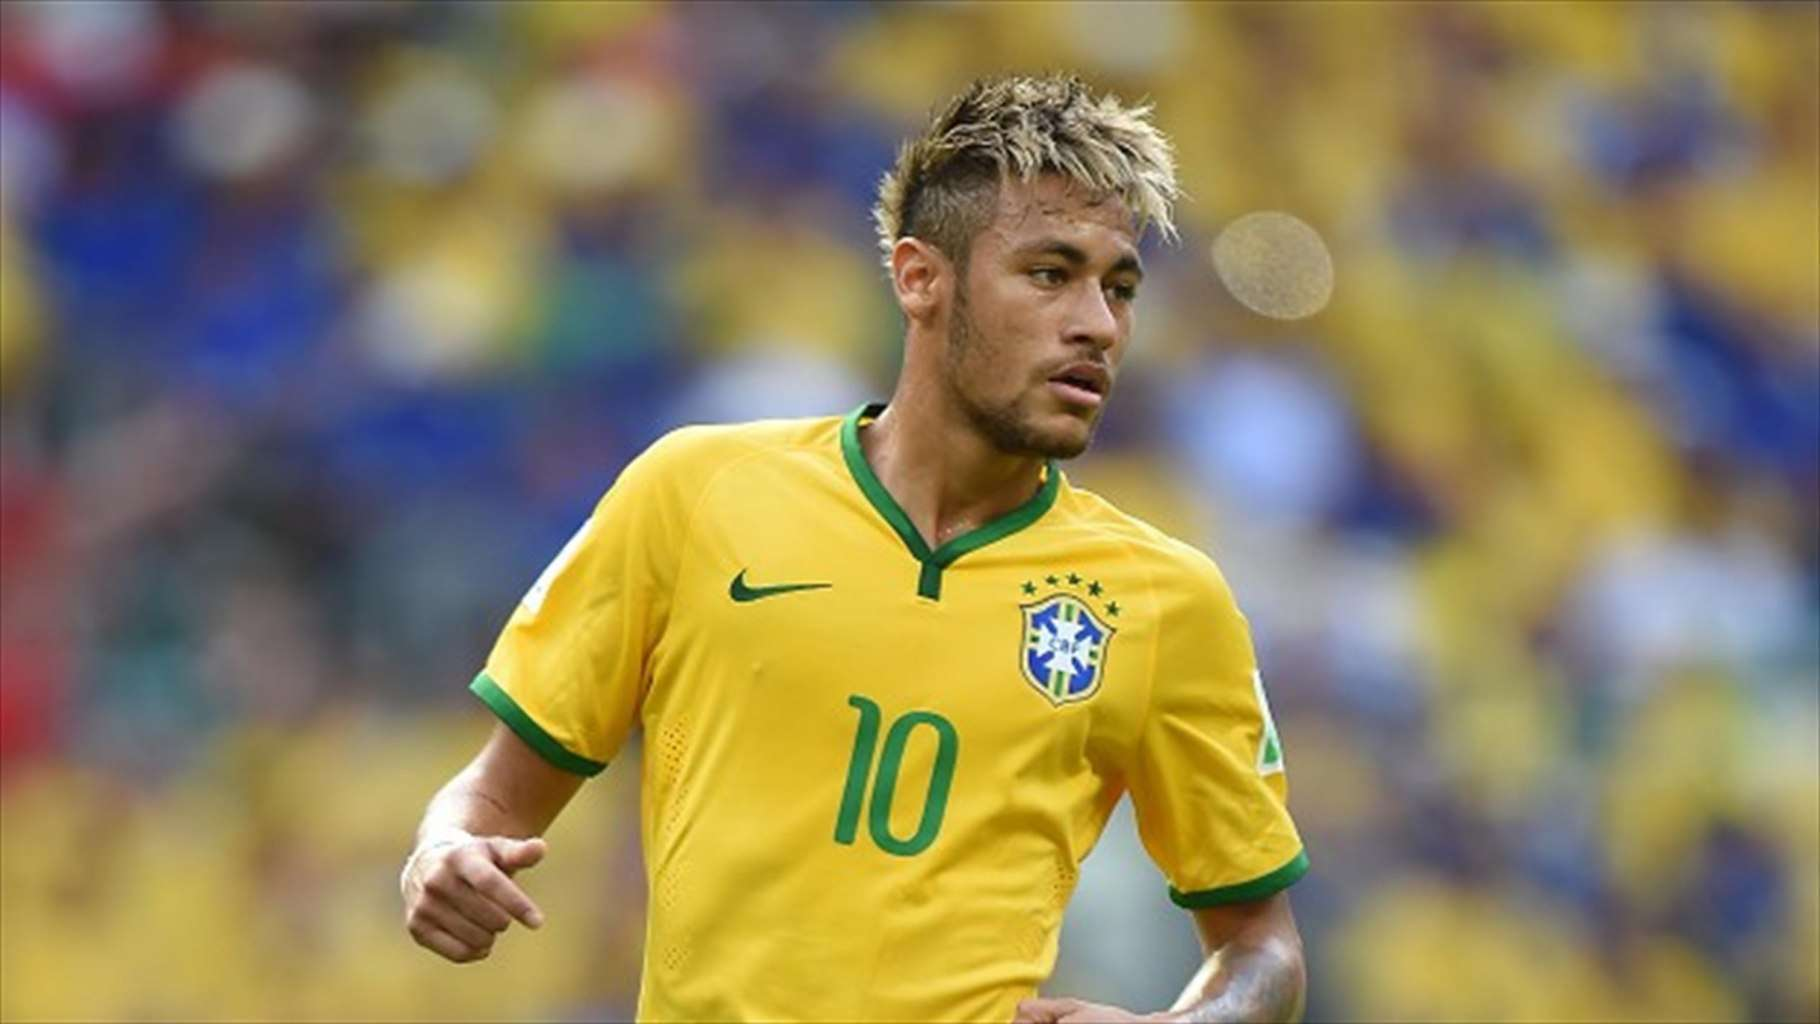 Neymar wallpaper hd 2016 wallpapersafari - Neymar brazil hd ...